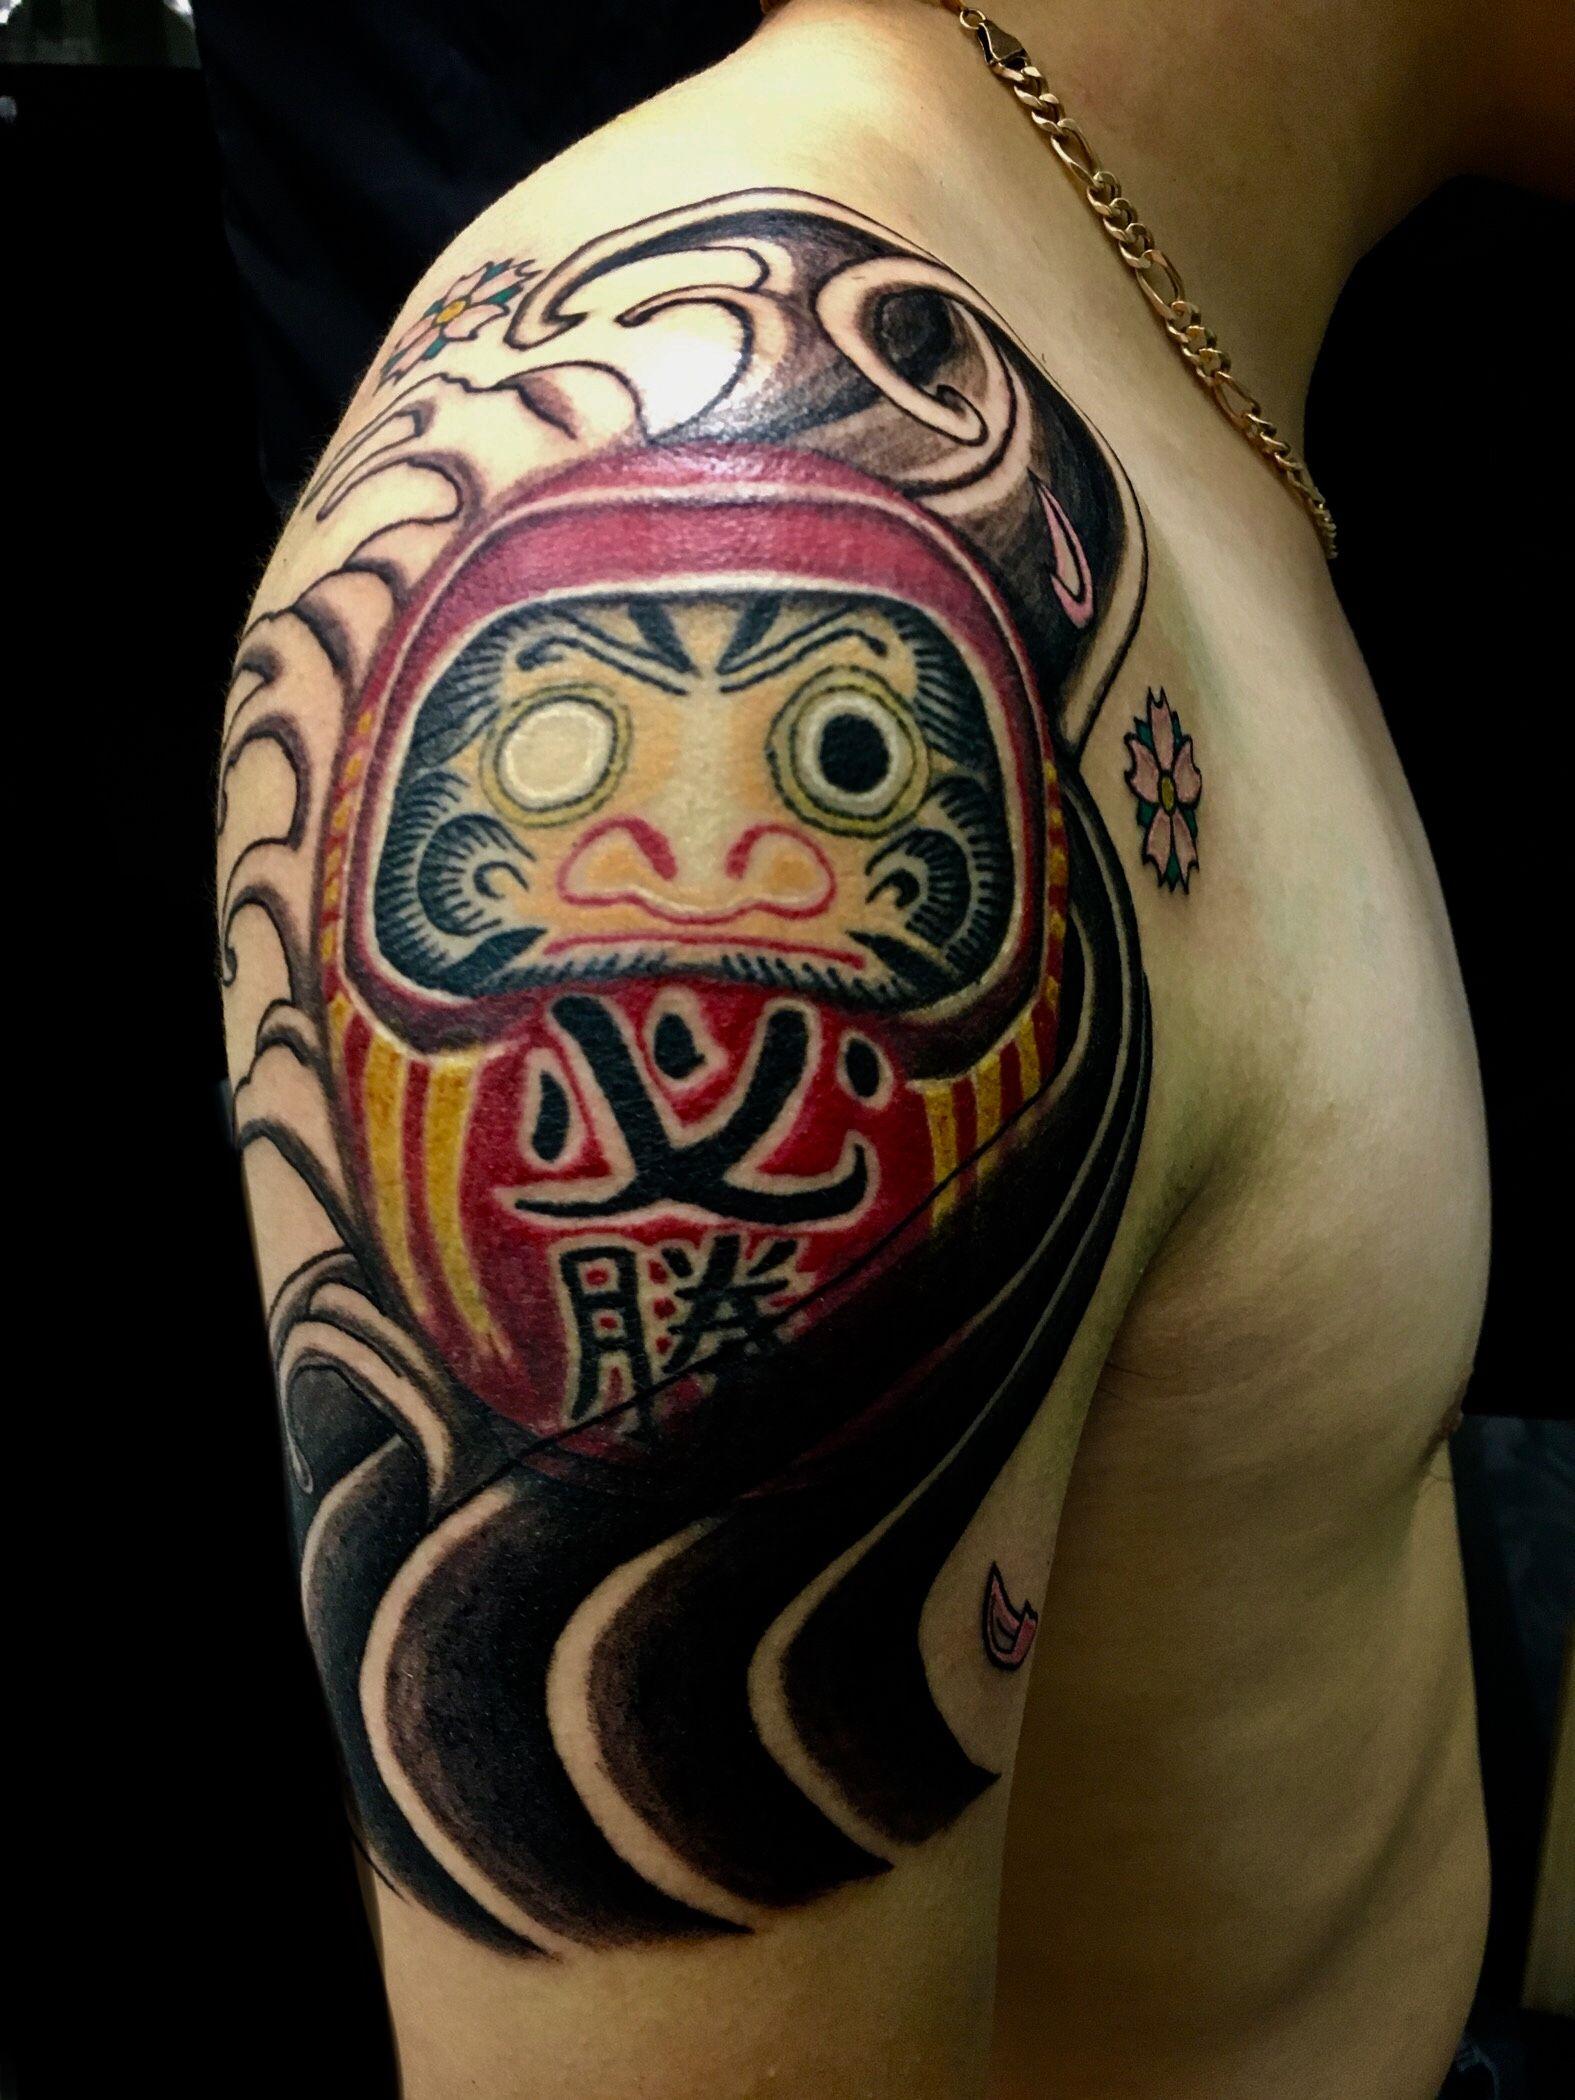 Daruma tattoo done by jon koon at artistic studio hair and